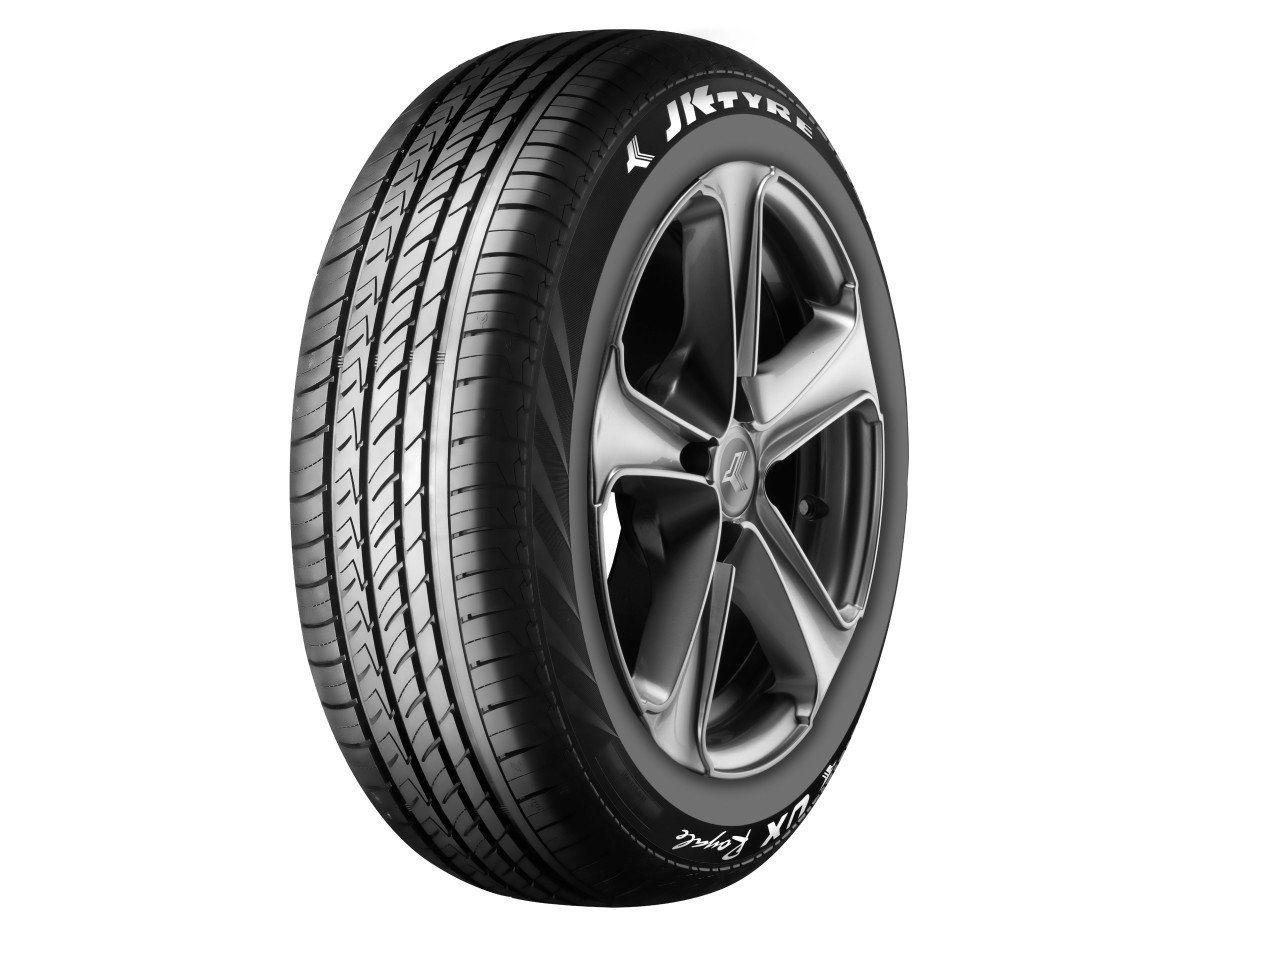 JK Tyre UX Royale A/S 175/65R-14 5258IN